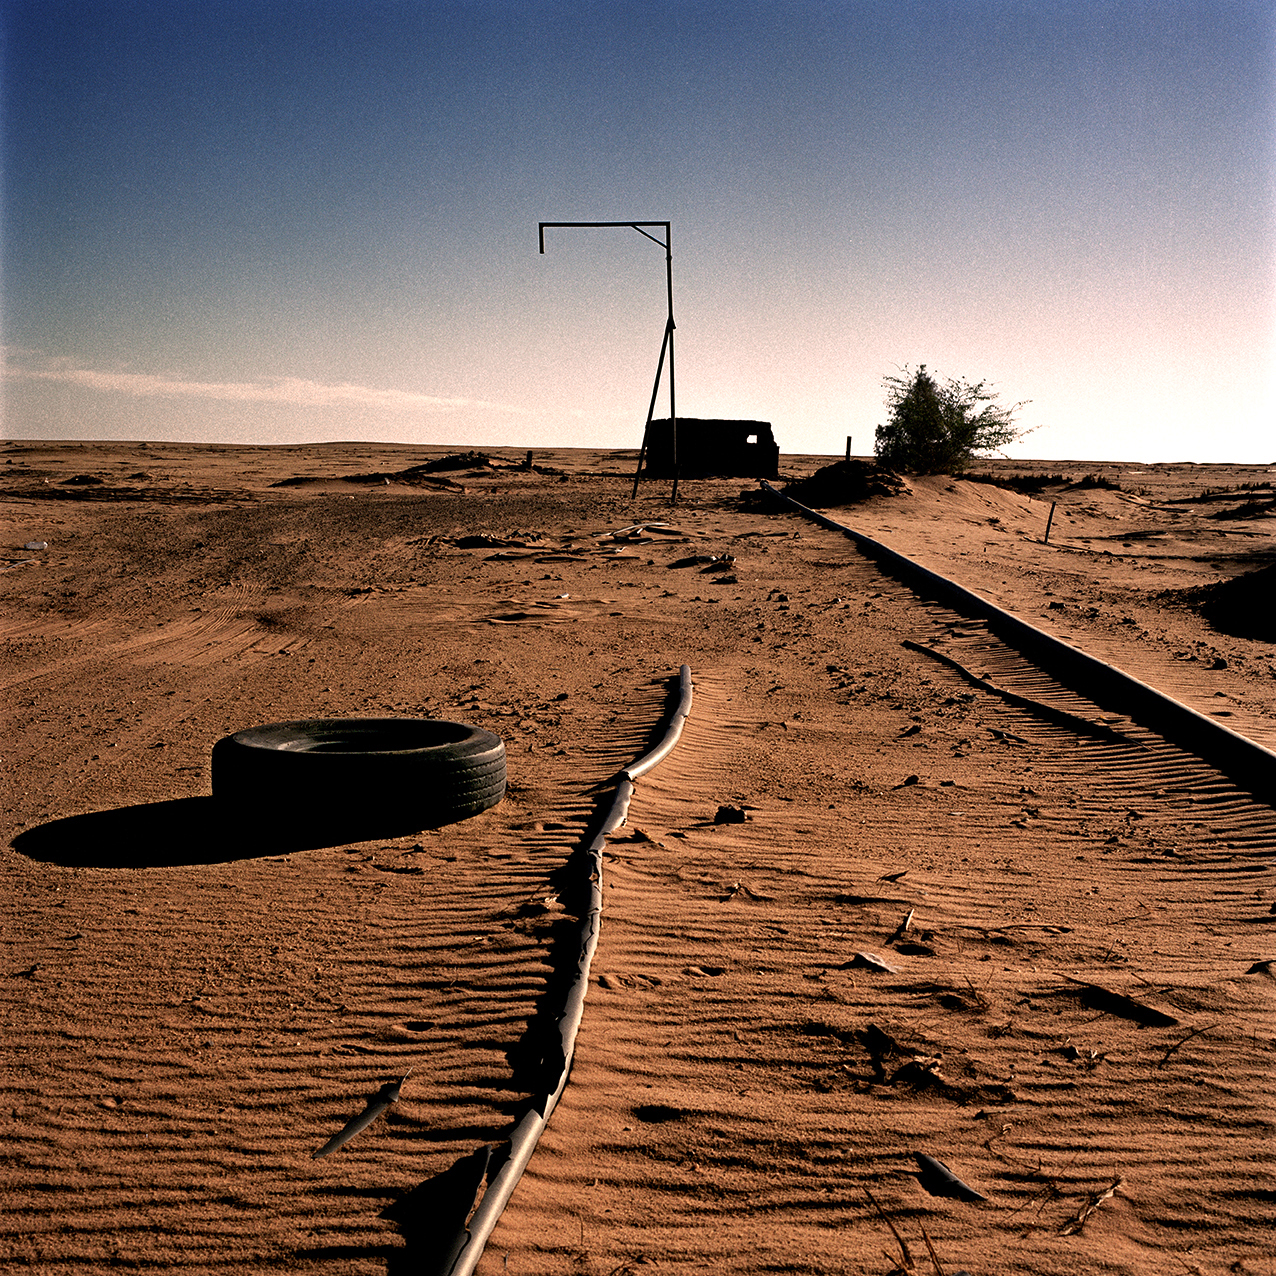 Bruno Hadjih / Picturetank HAB0516971. Courtesy galerie Mamia Bretesche. Algérie - 22/02/2011